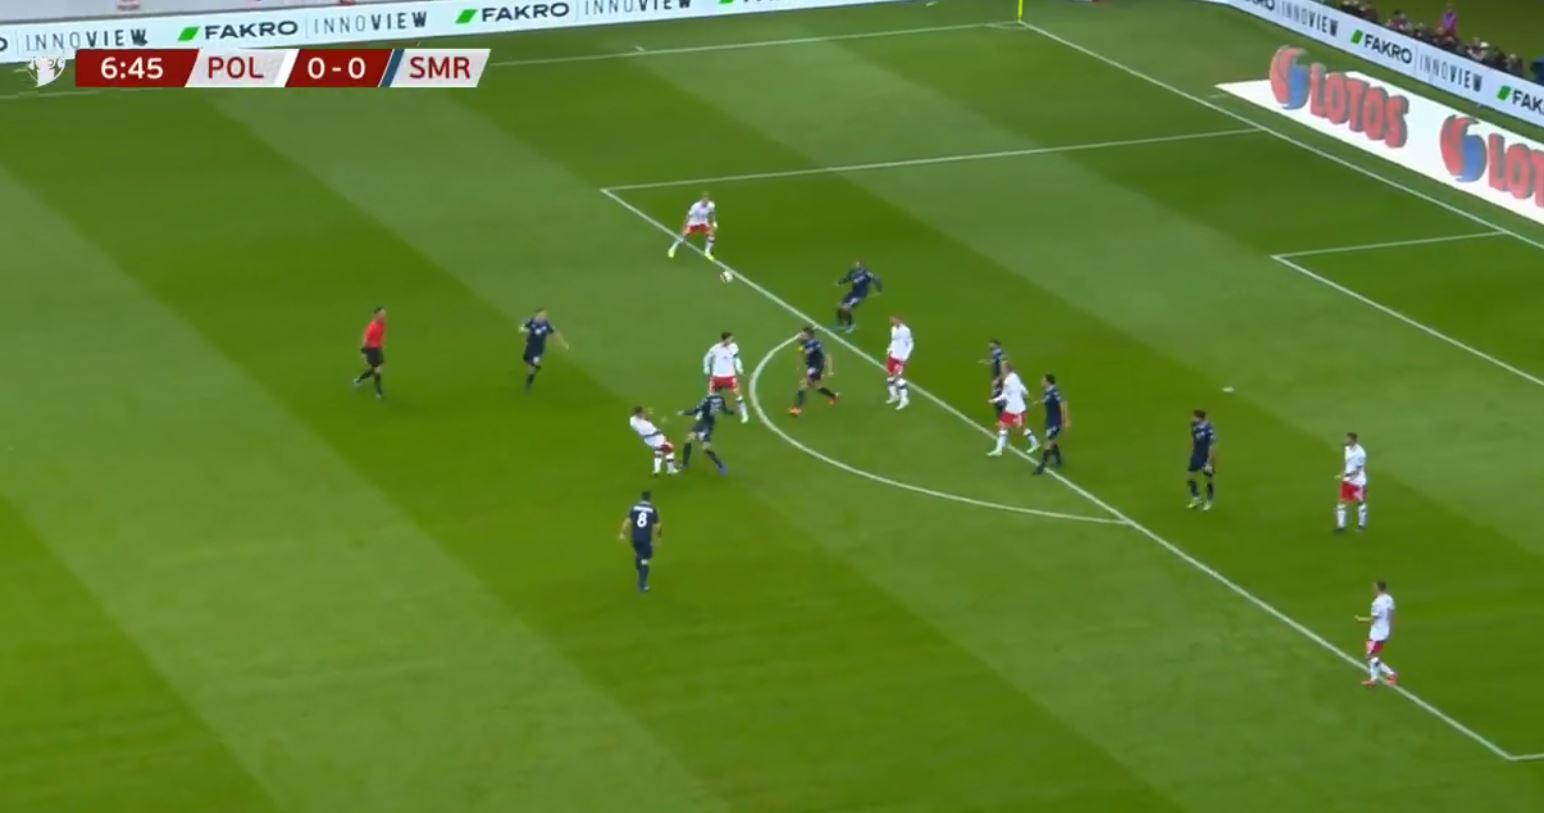 Poland 5-0 San Marino (WC Qualif) 2021.10.09 (19h45) Full Goals Highlight